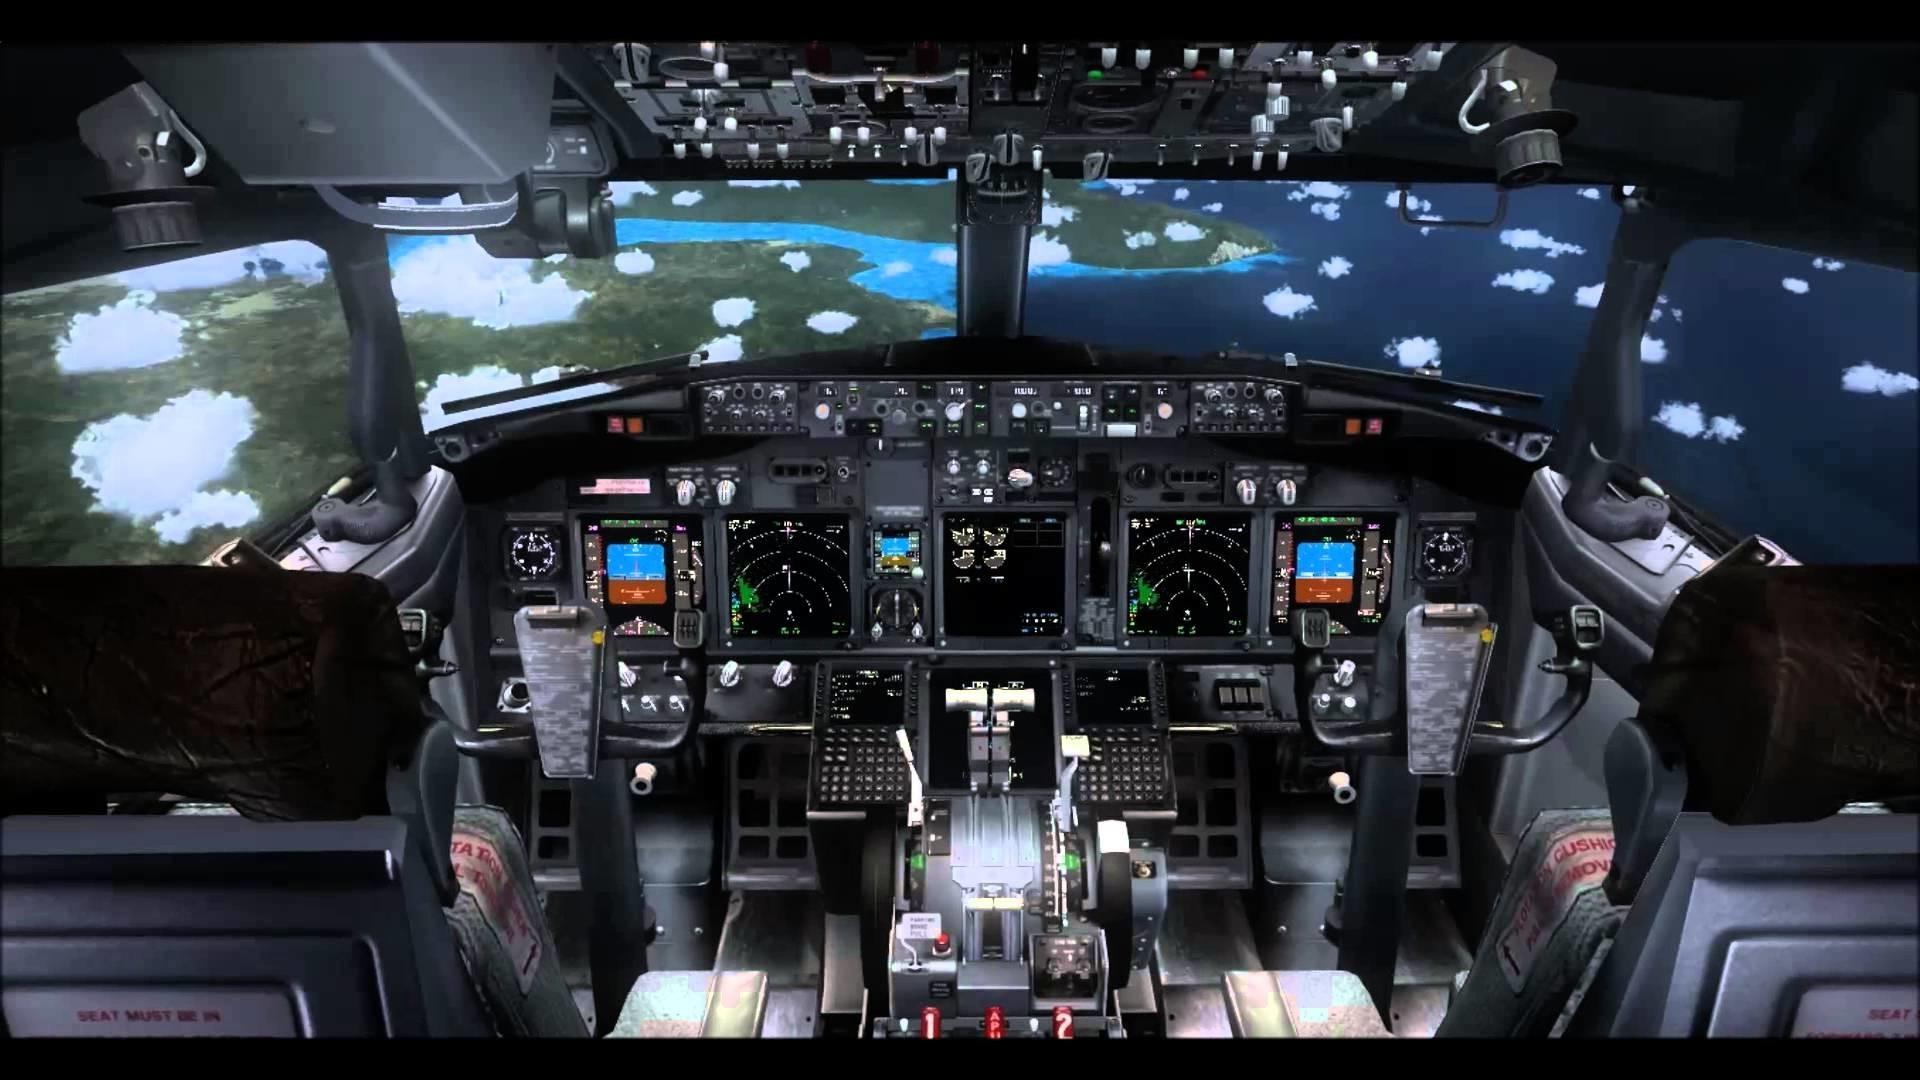 787 COCKPIT WALLPAPER image galleries – imageKB.com